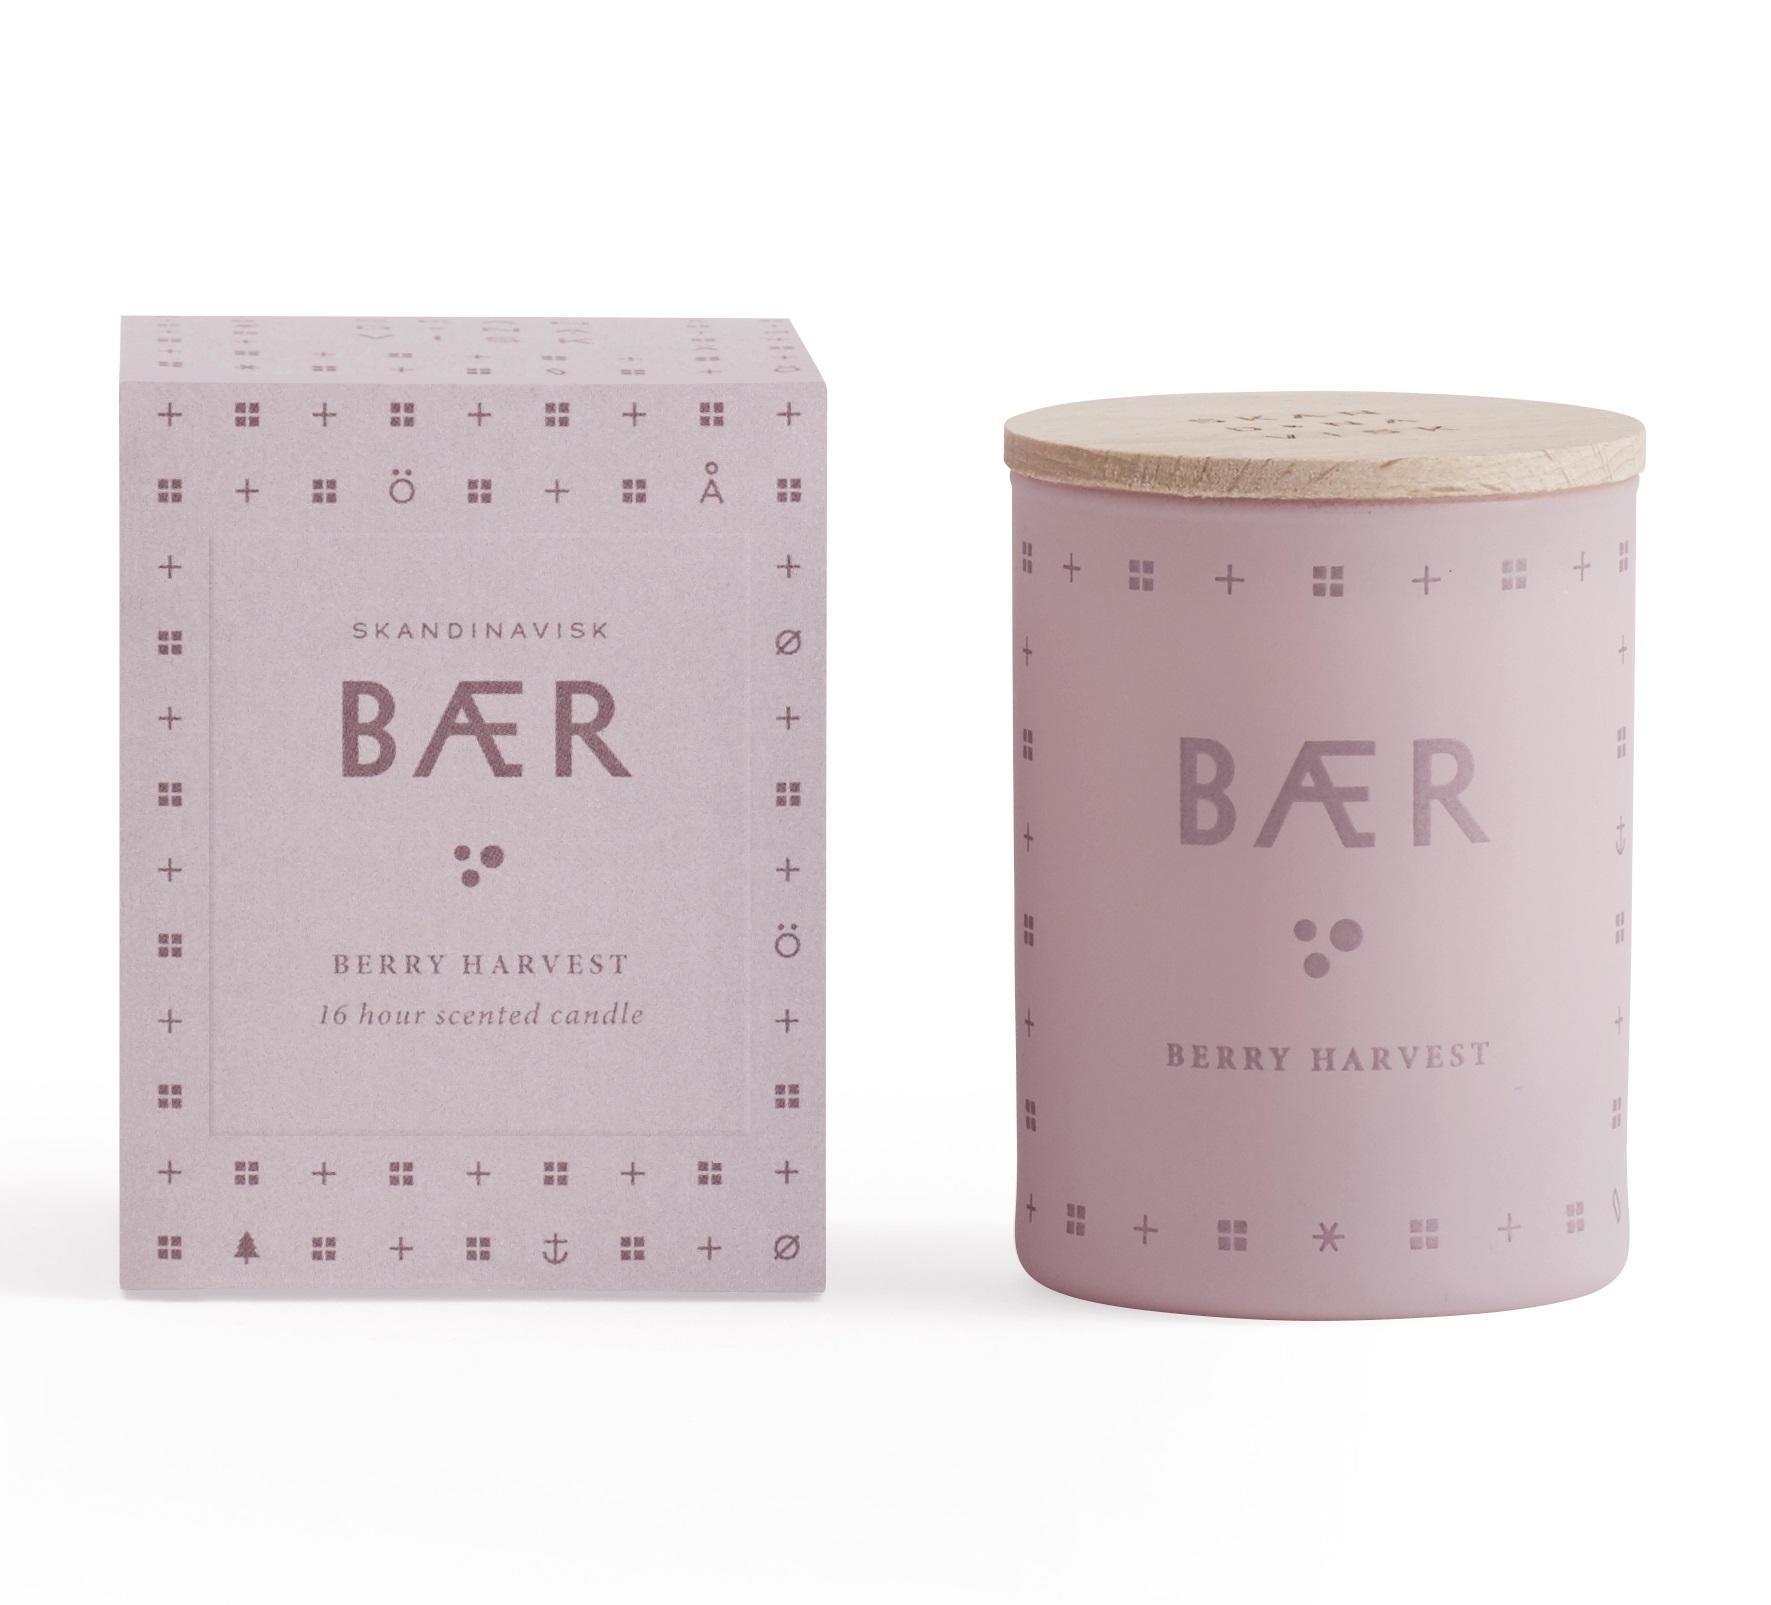 SKANDINAVISK Vonná svíčka BÆR (lesní plody) mini 55 g, růžová barva, sklo